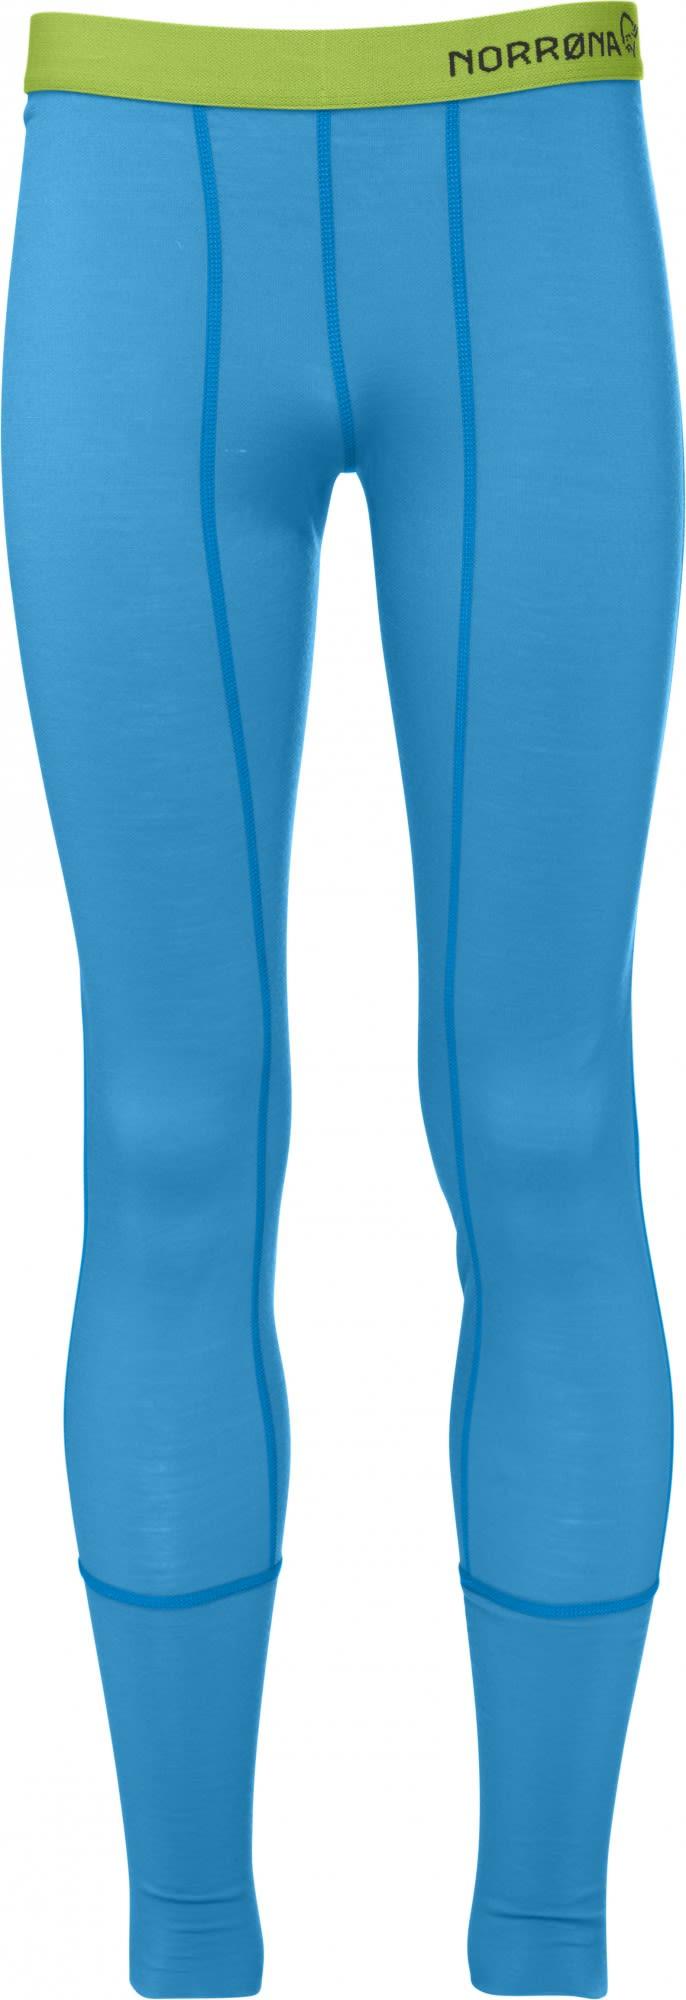 Norrona Junior Longs Blau, Merino 128 -Farbe Signal Blue, 128